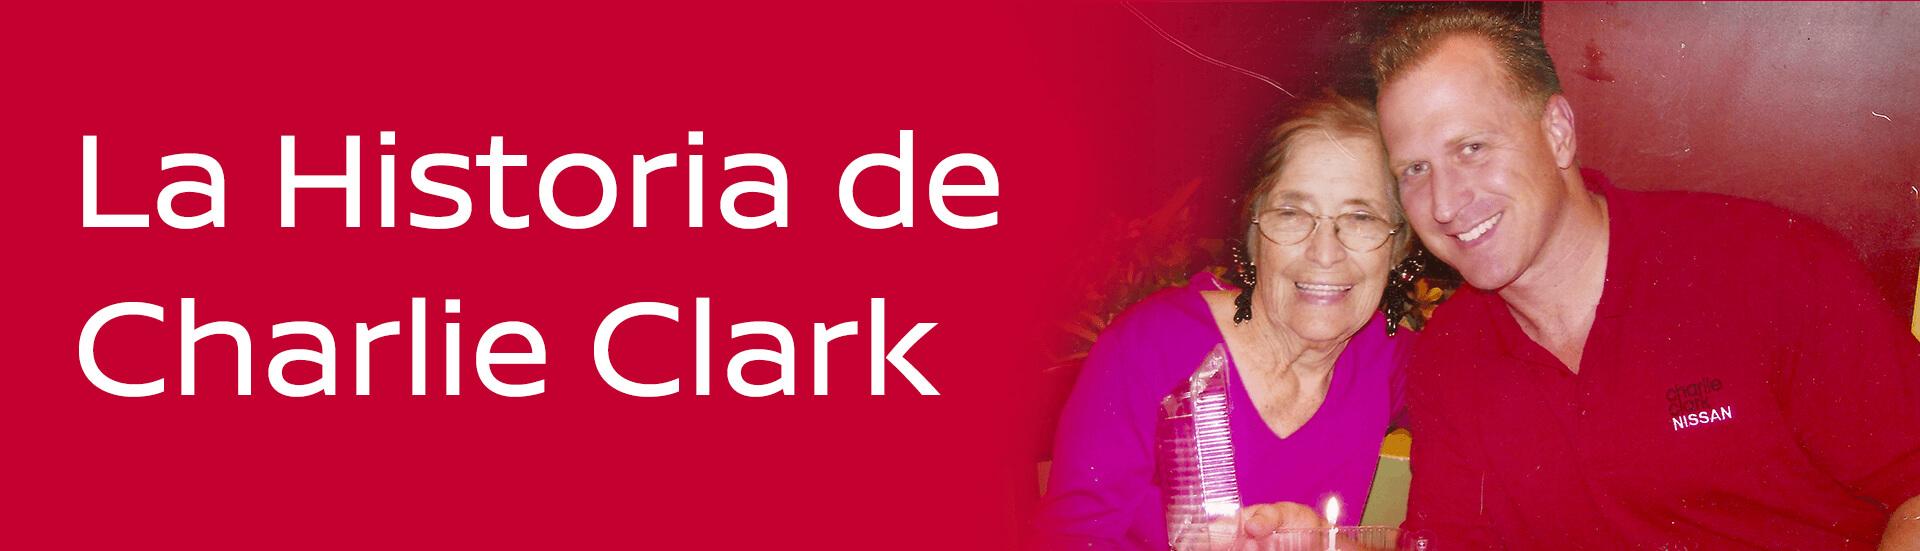 La Historia de Charlie Clark